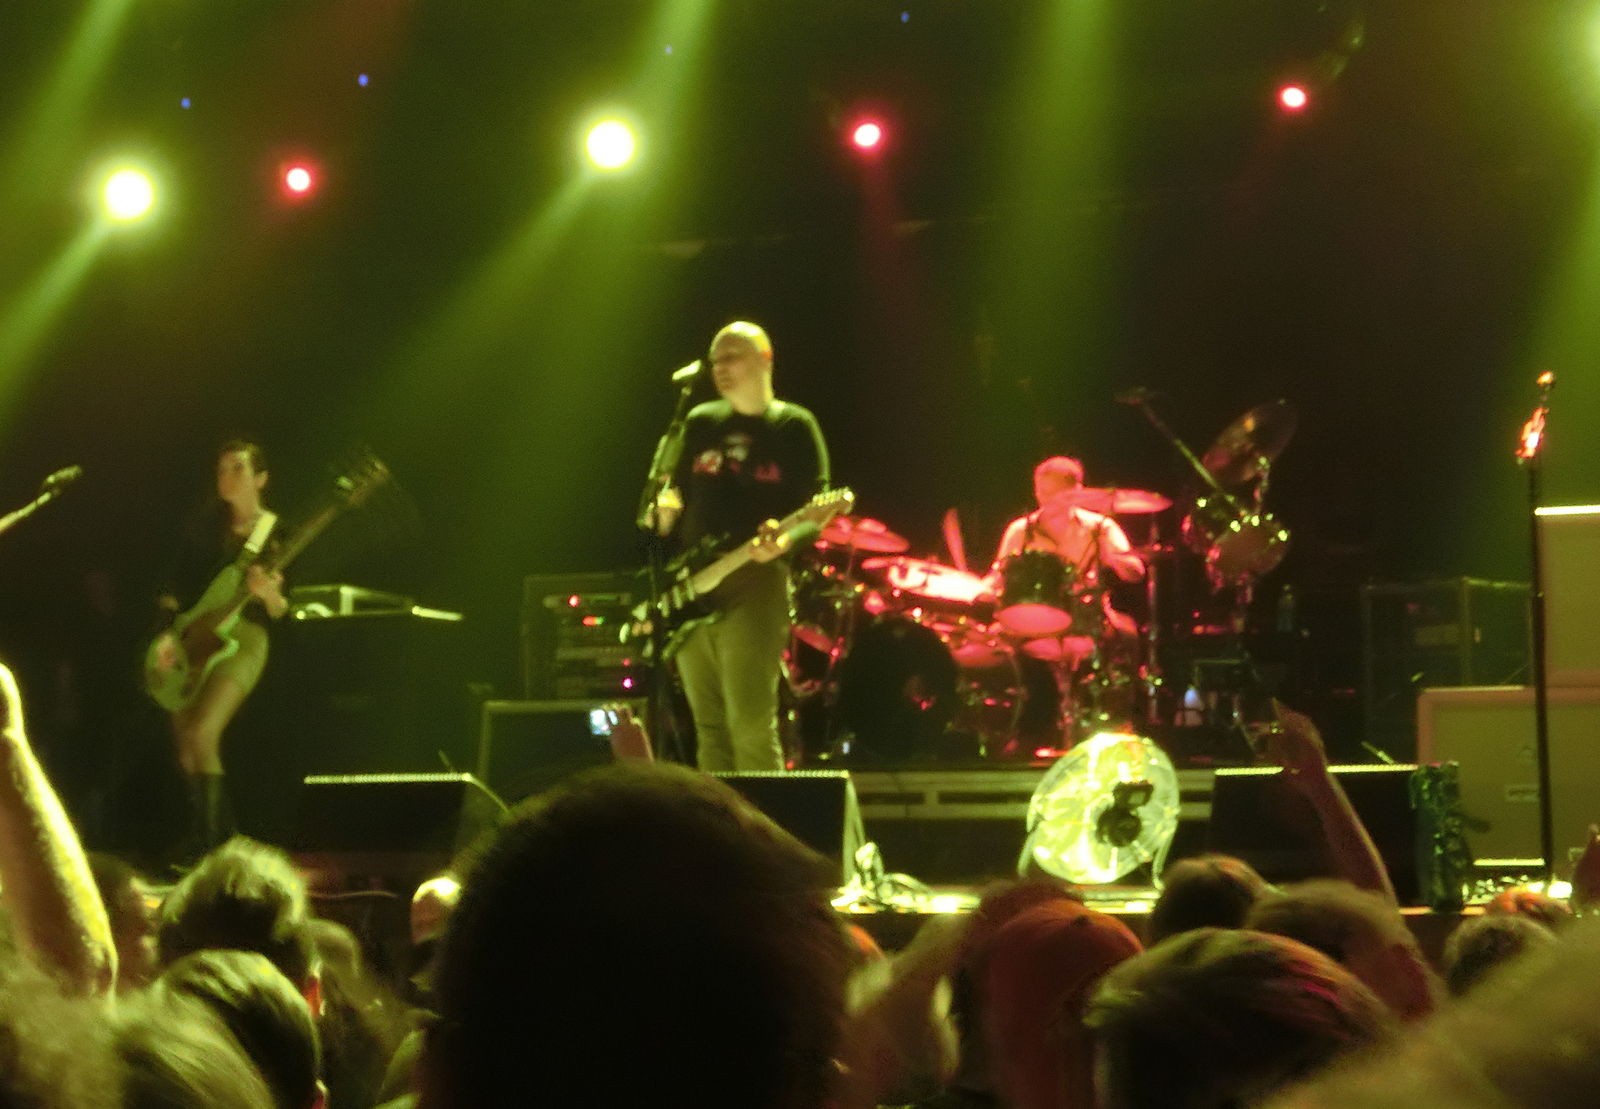 The Smashing Pumpkins @ A2, St Petersburg, Russia 2013.08.05